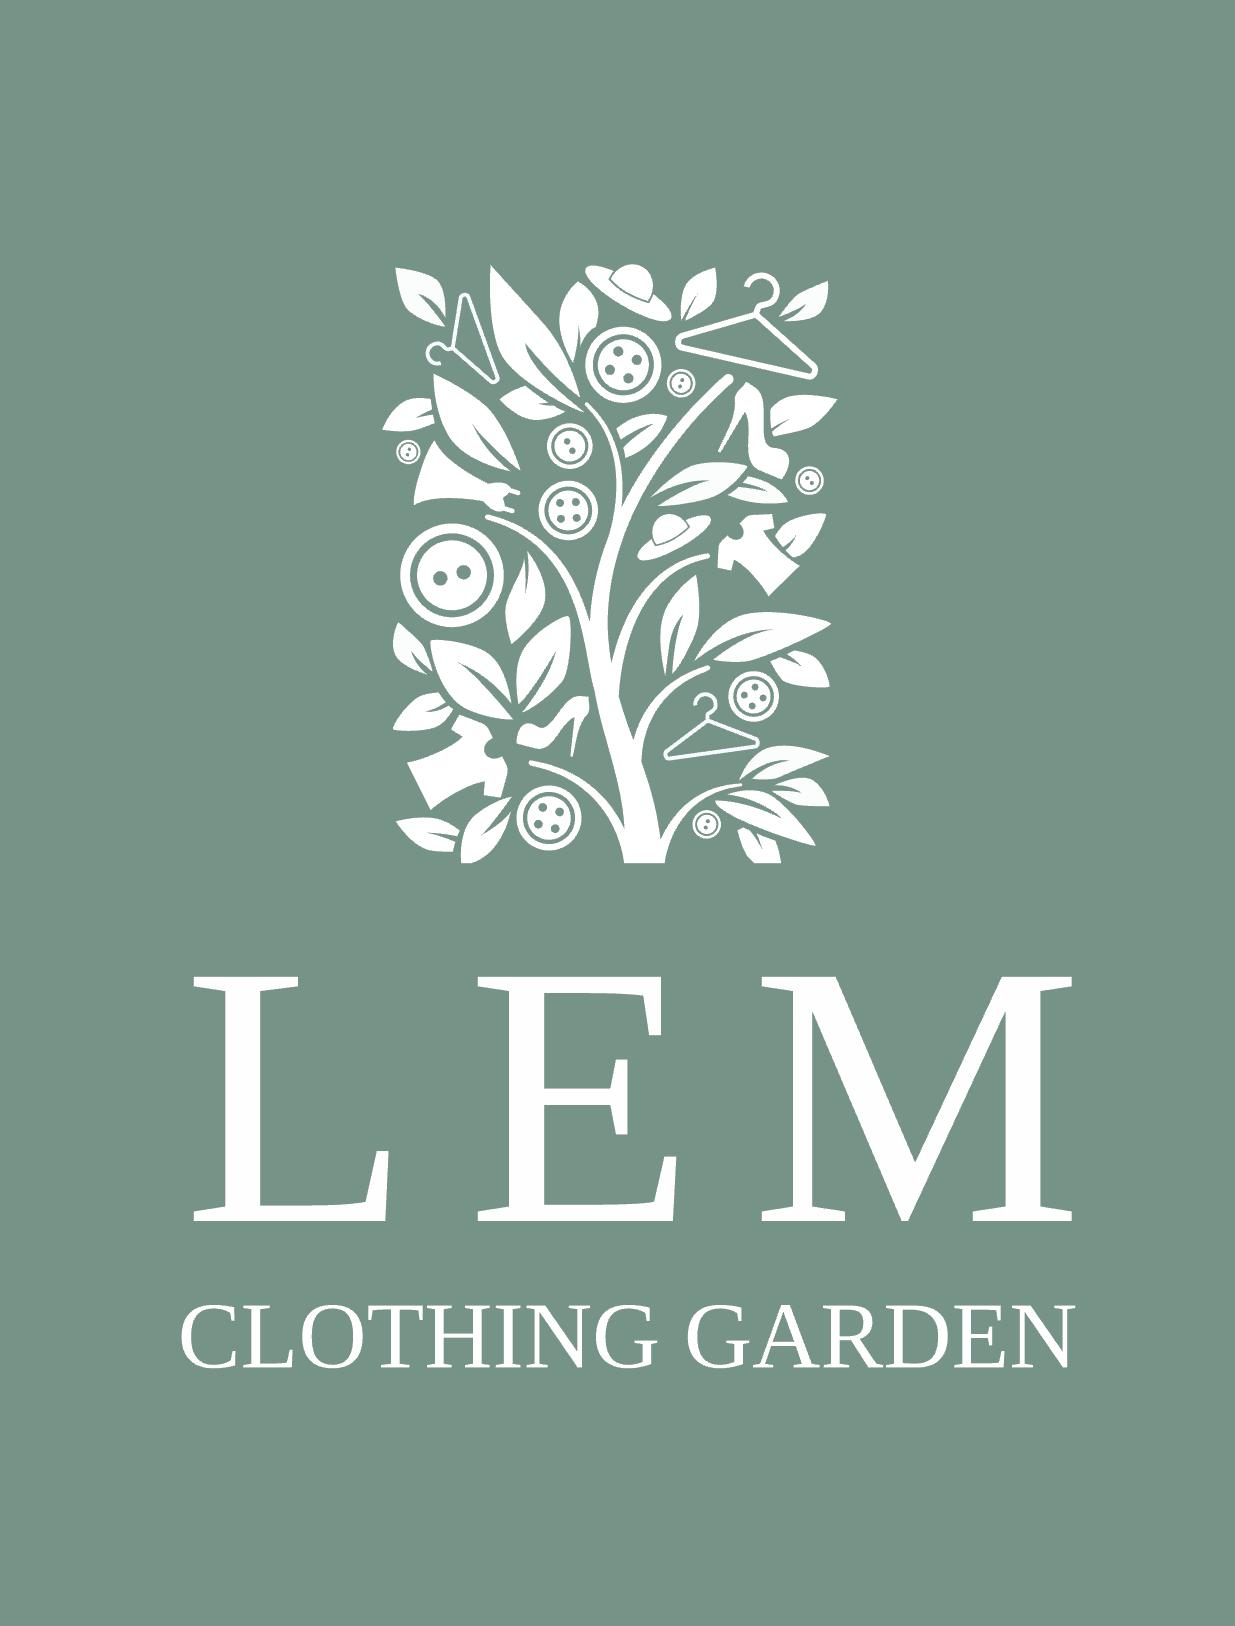 Lem-Clothing-Garden_001.PNG